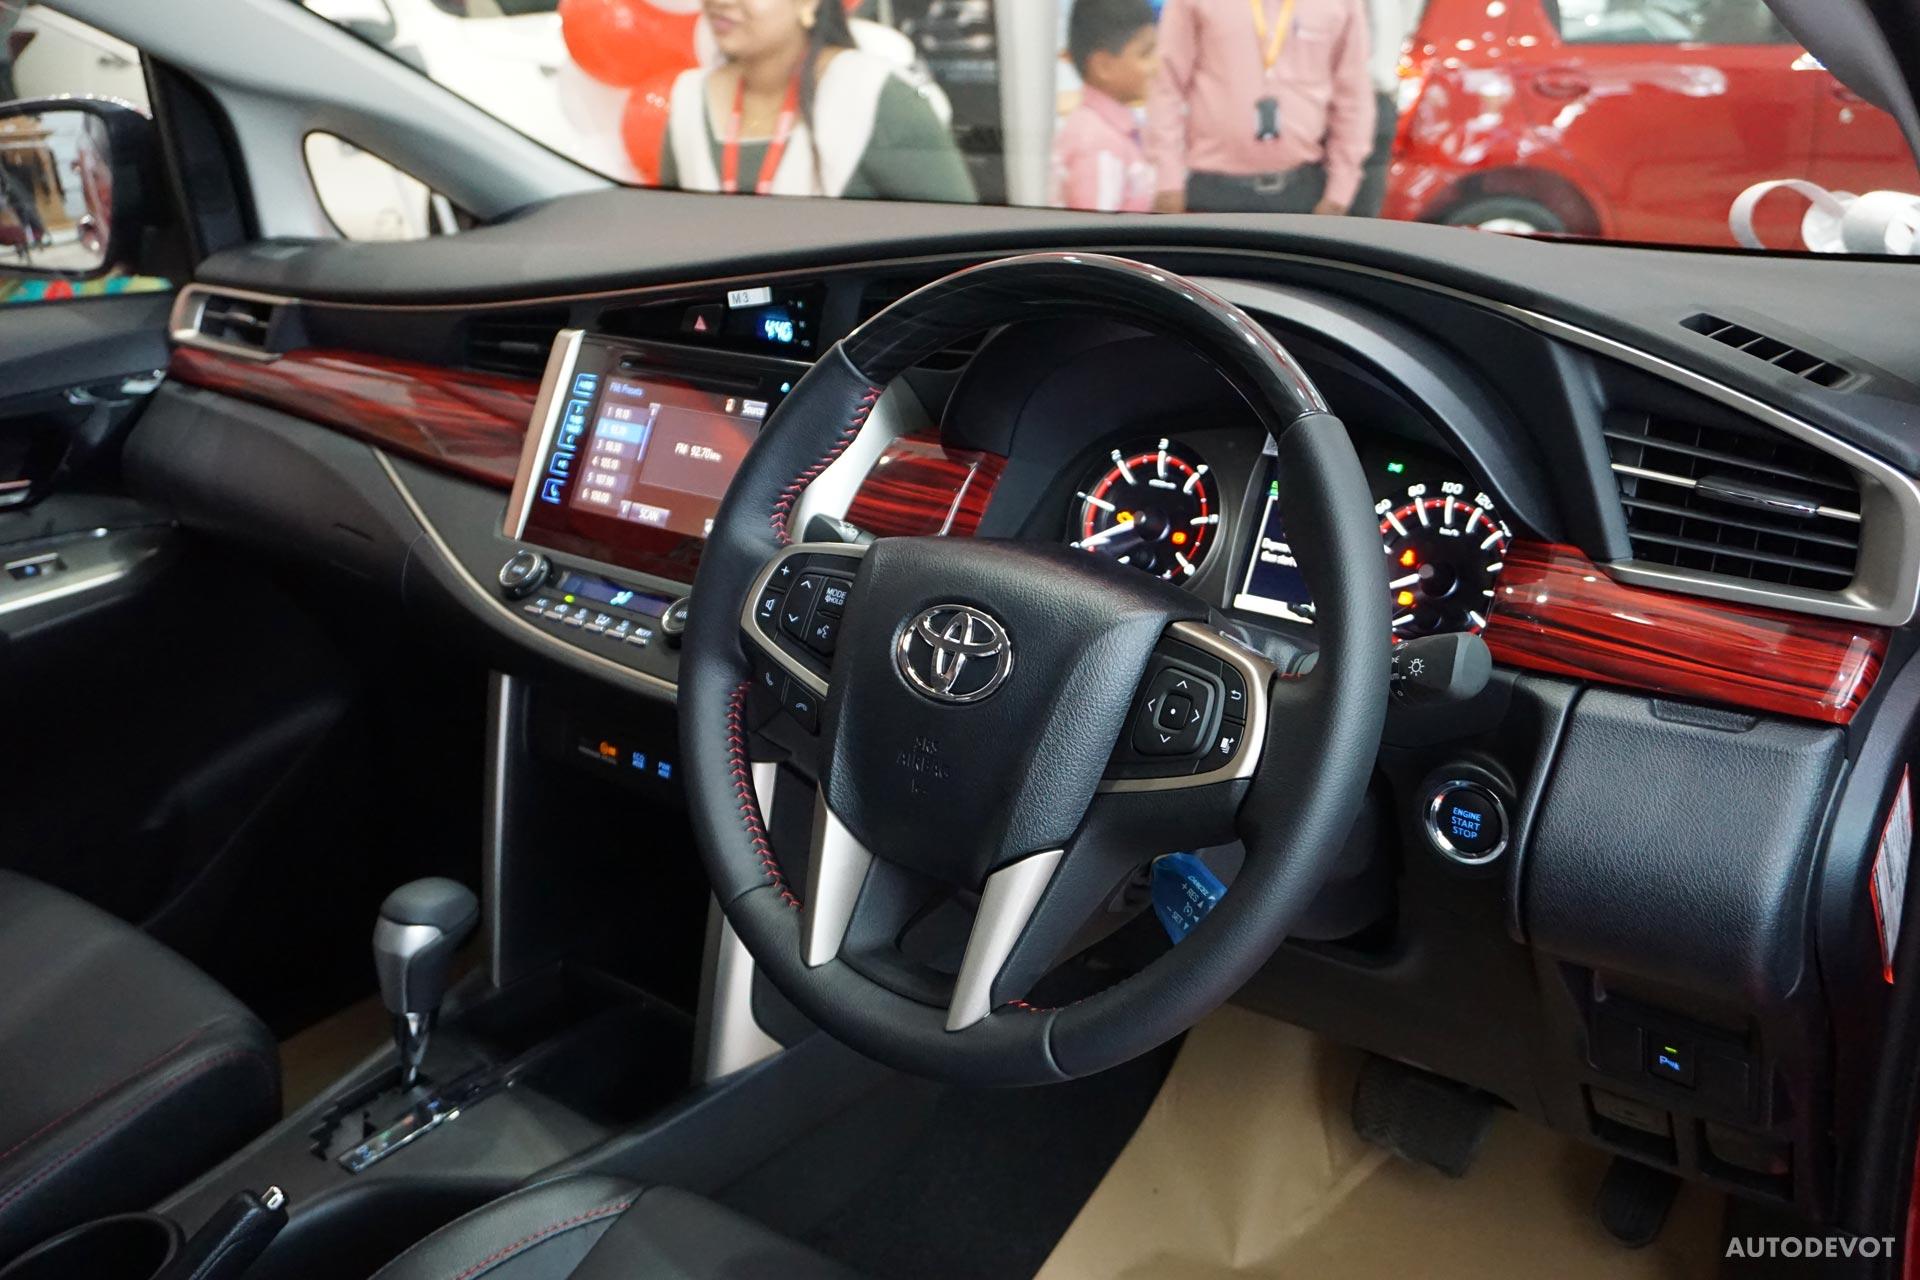 Toyota-Innova-Touring-Sport-interior